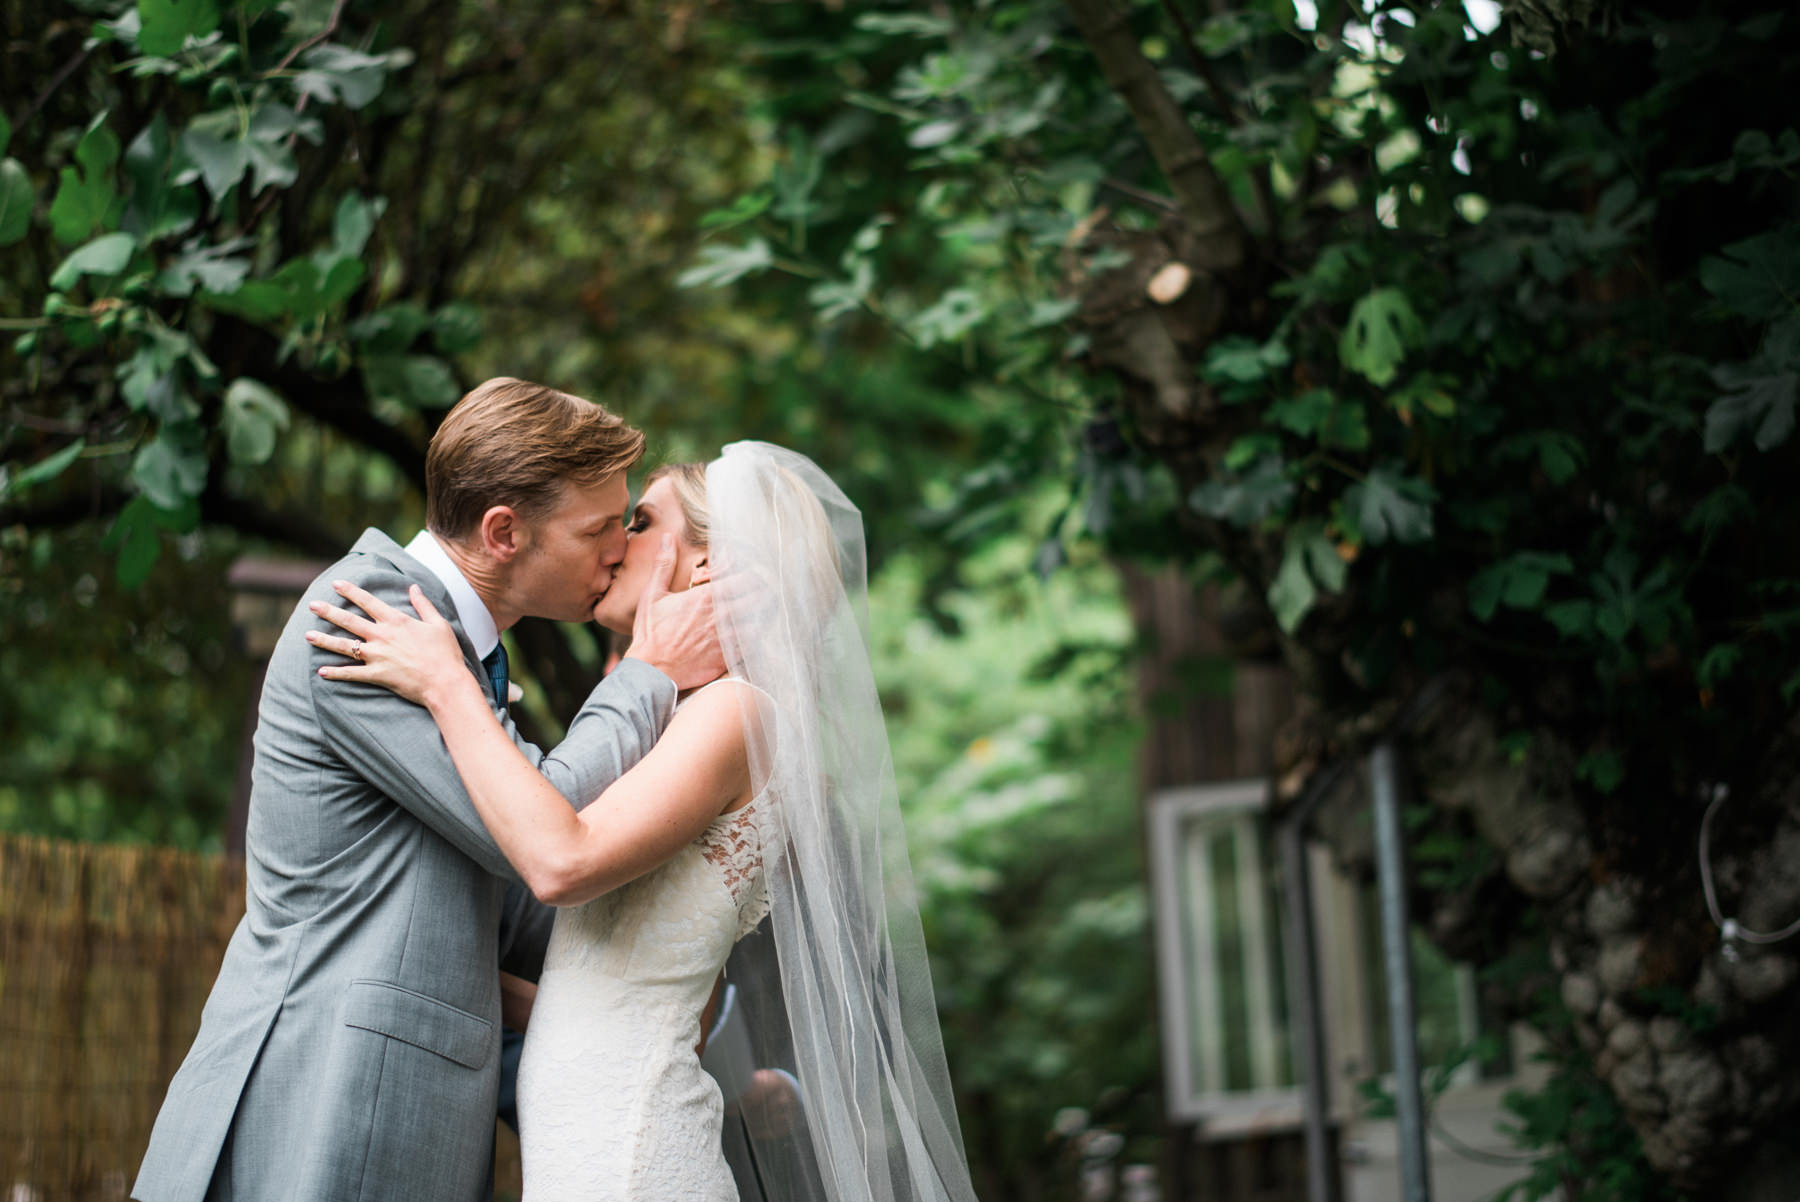 216-outdoor-wedding-ceremony-at-the-corson-building.jpg